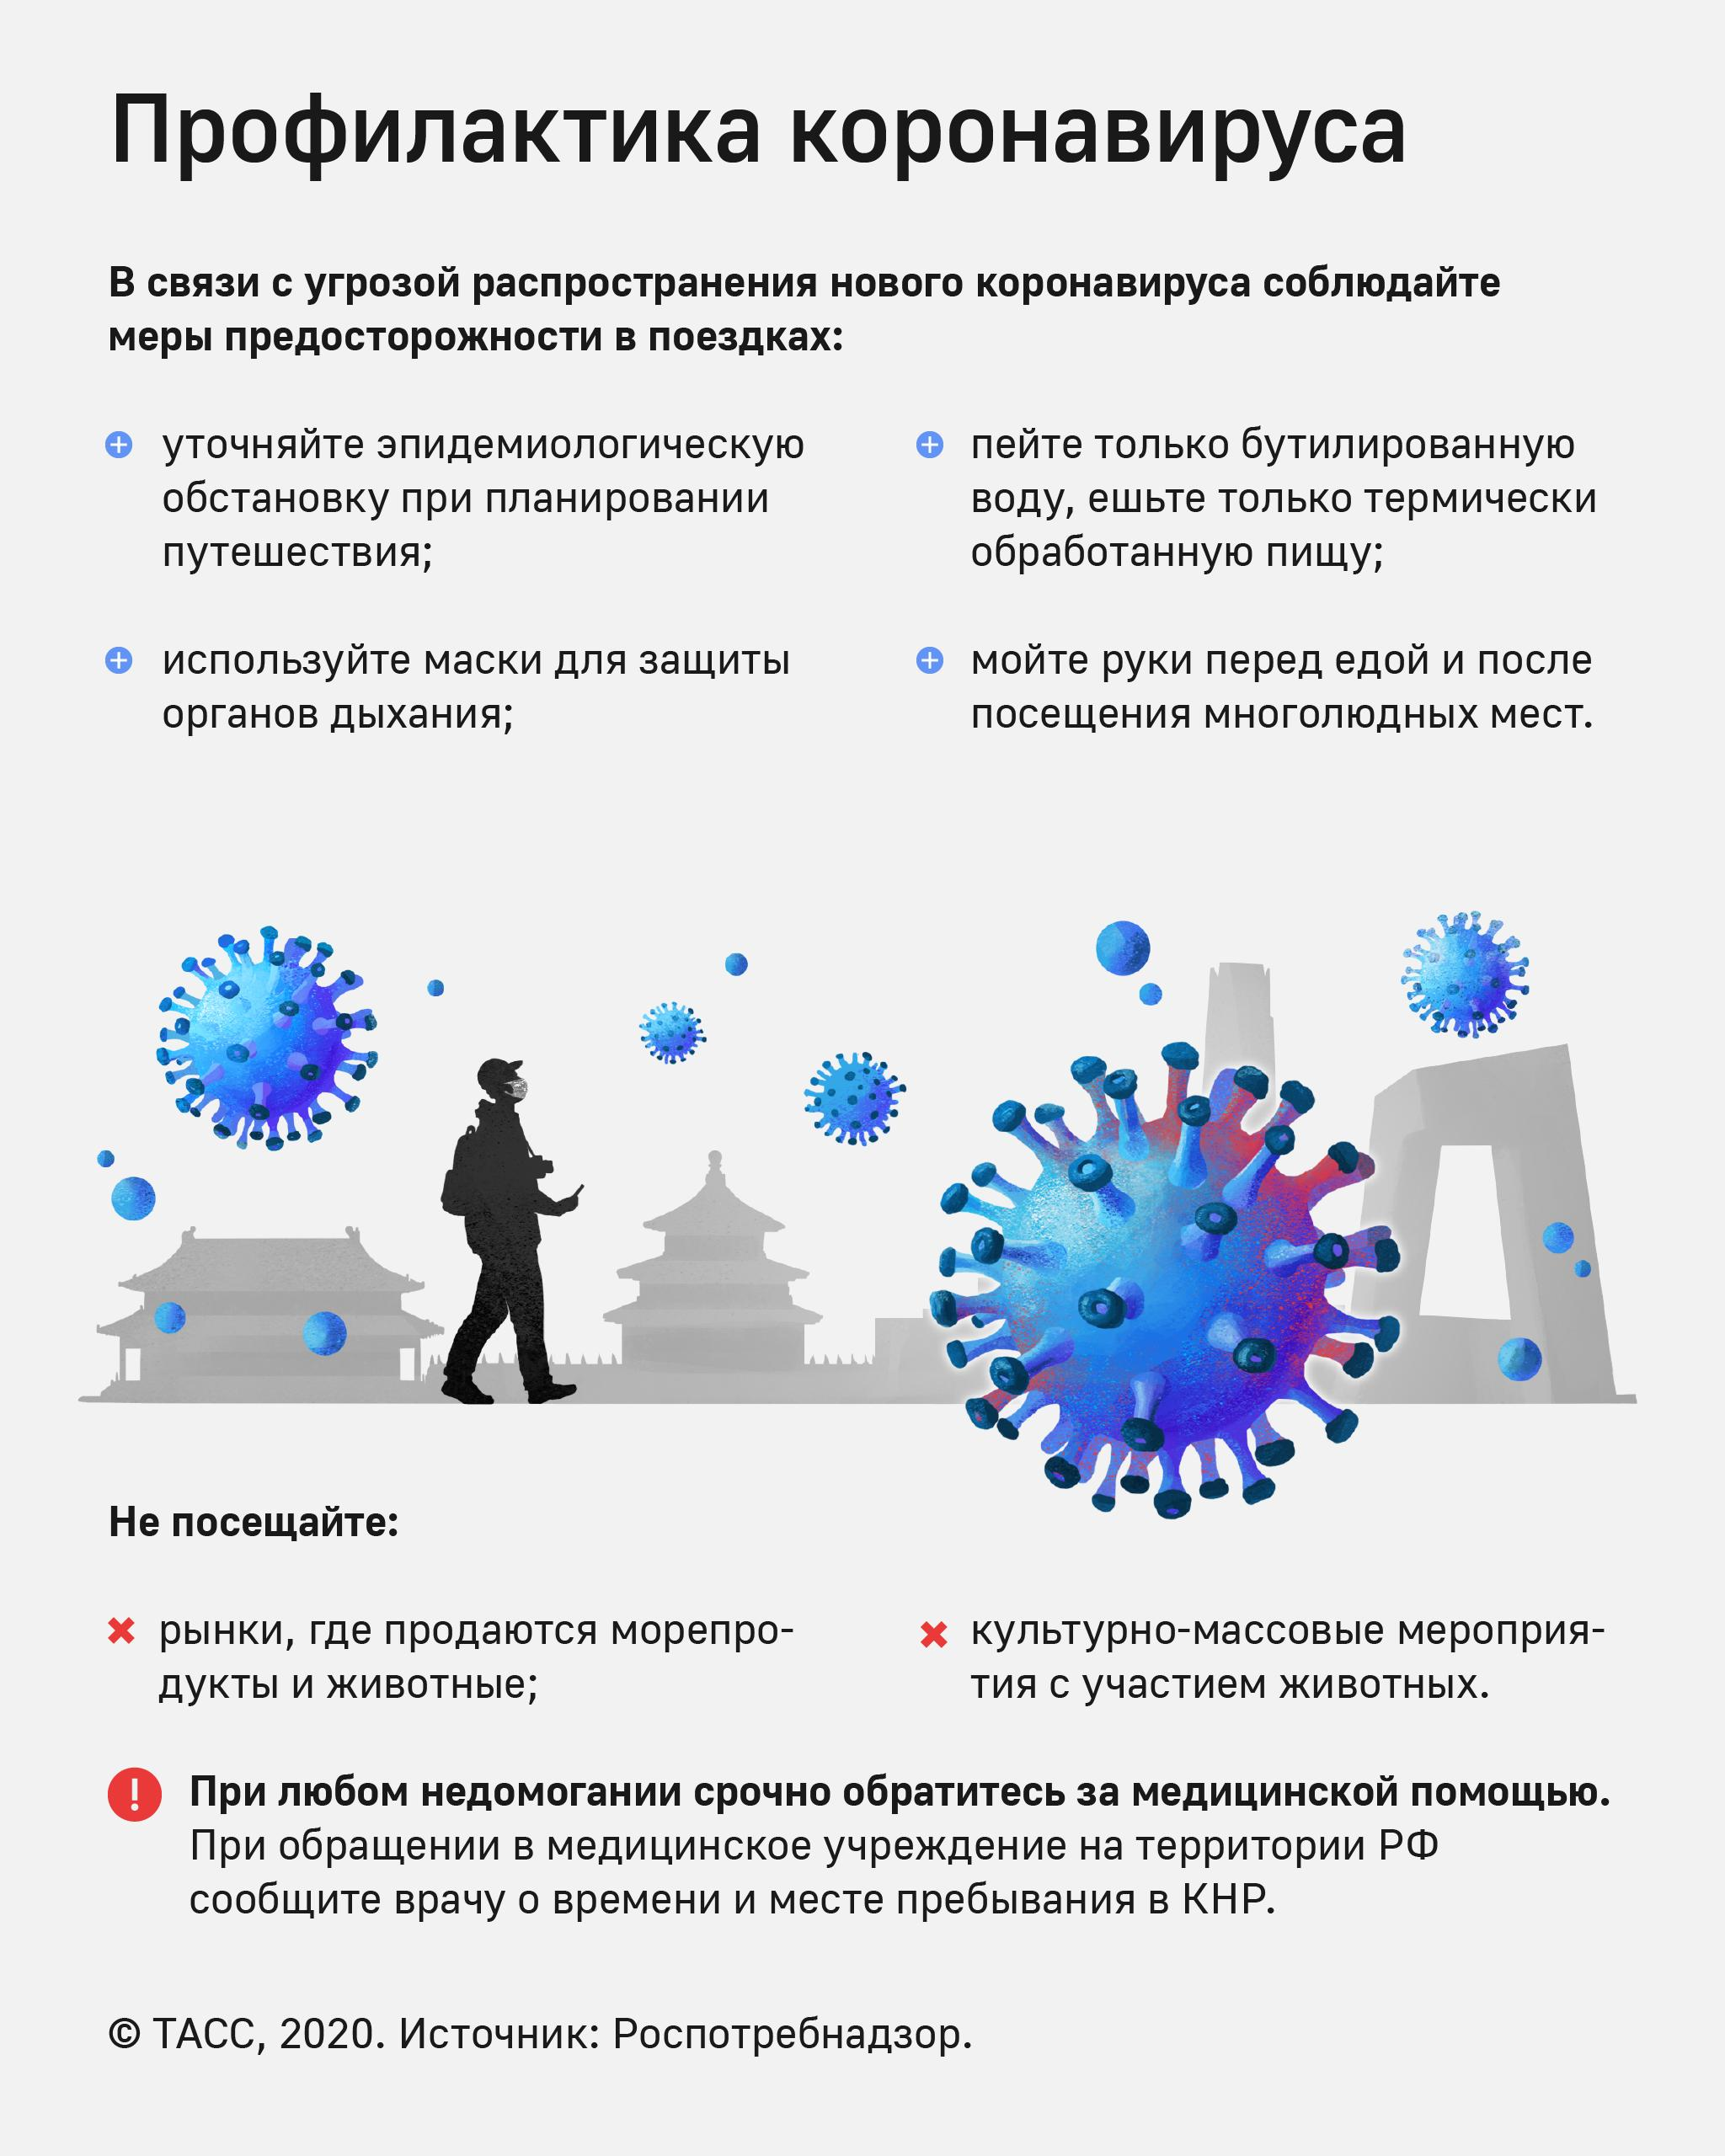 Инфографика © ТАСС